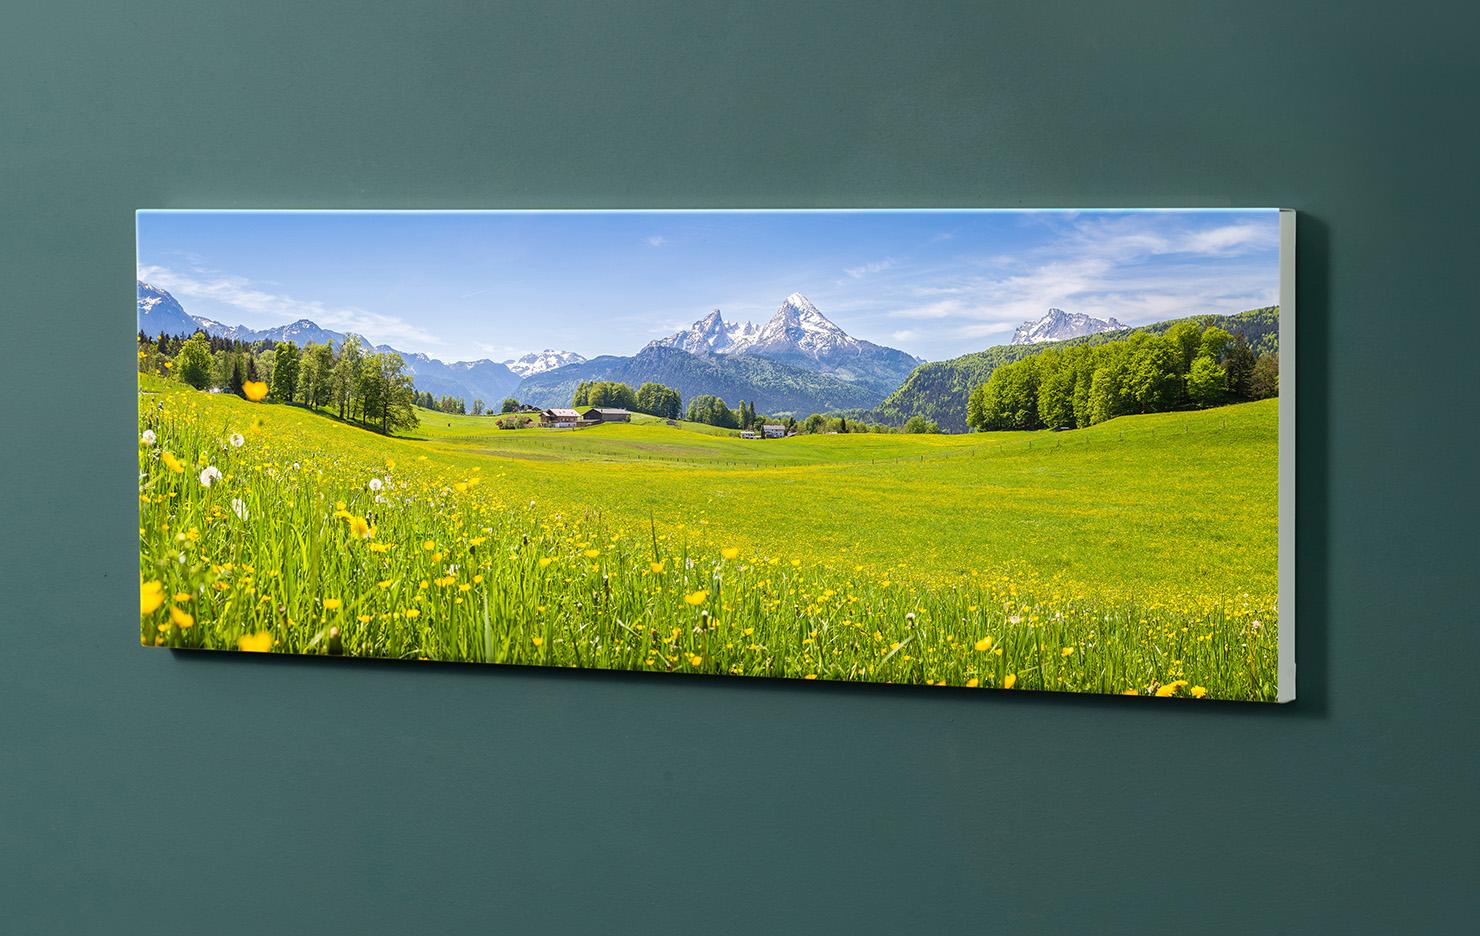 Magnettafel NOTIZ 90x30cm Motiv-Pinnwand M108 Wiese Berge